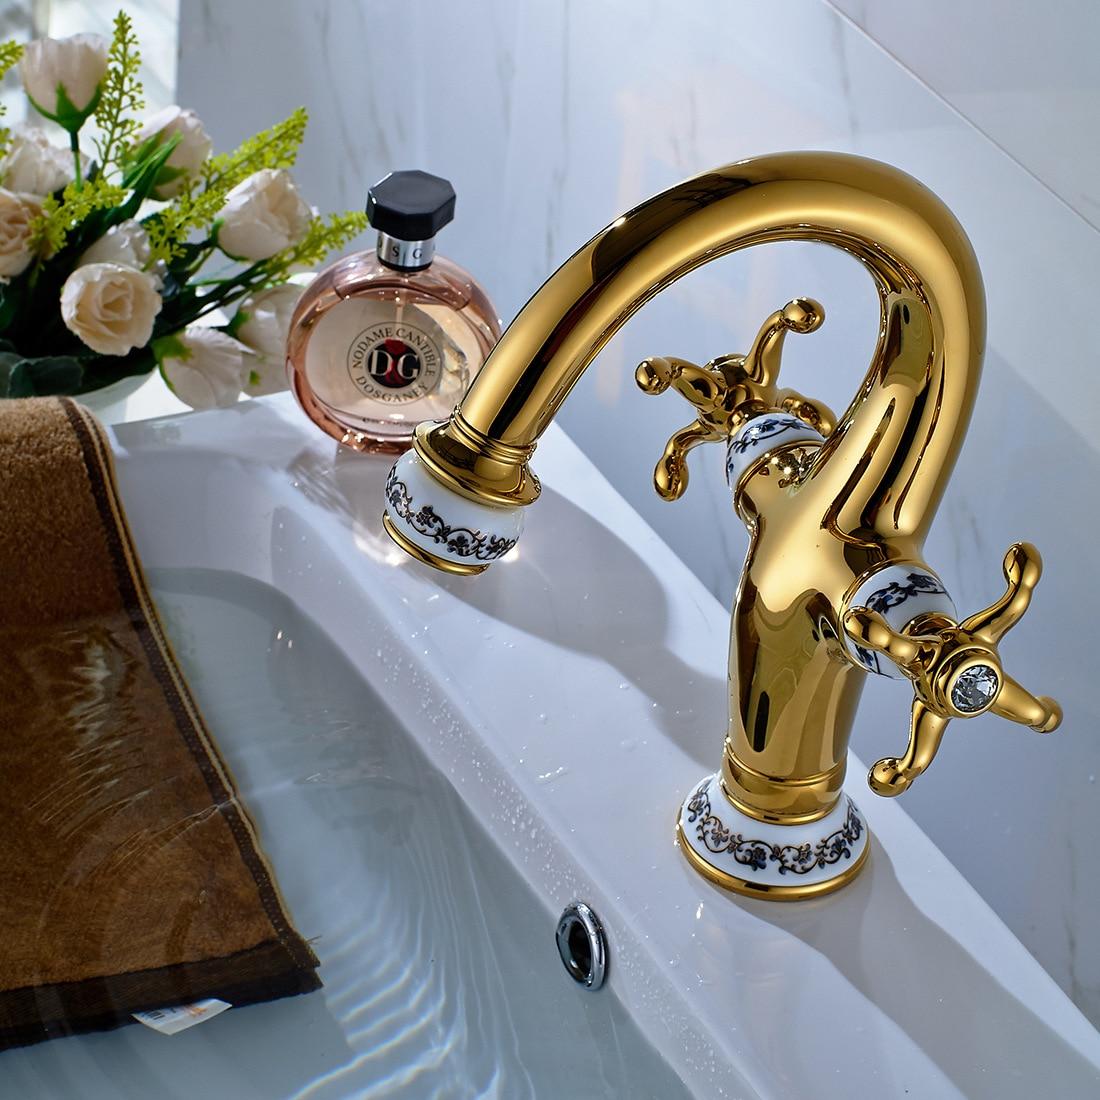 Basin Faucet Blue White Porcelain Luxury Single Hole Dual Han ...